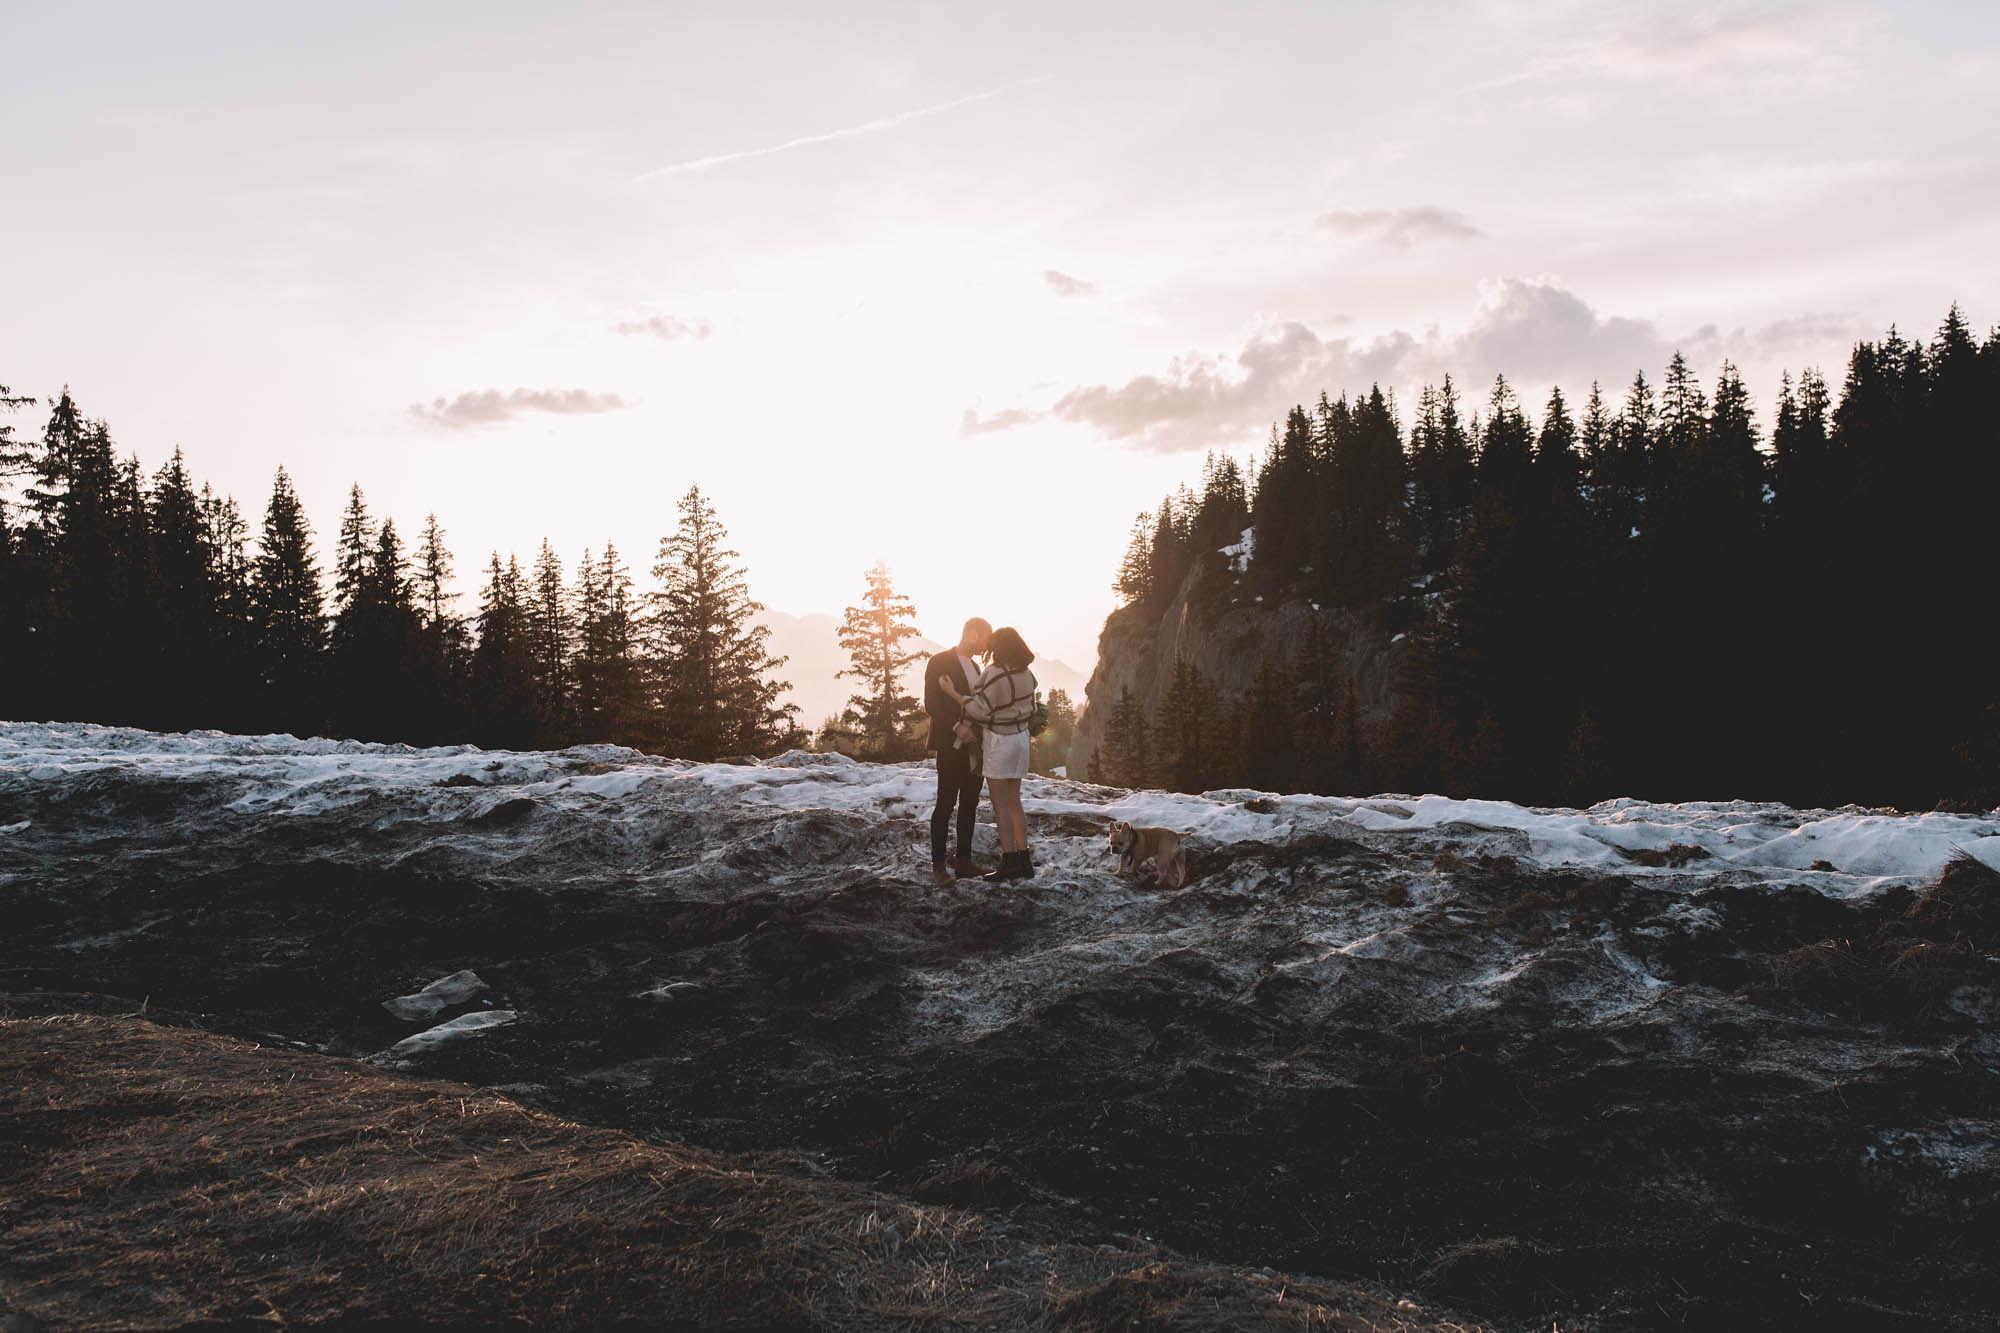 NOEMIE+VIANNEY_ALPEES_PHOTOGRAPHE_MARIAGE_LES BANDITS-04